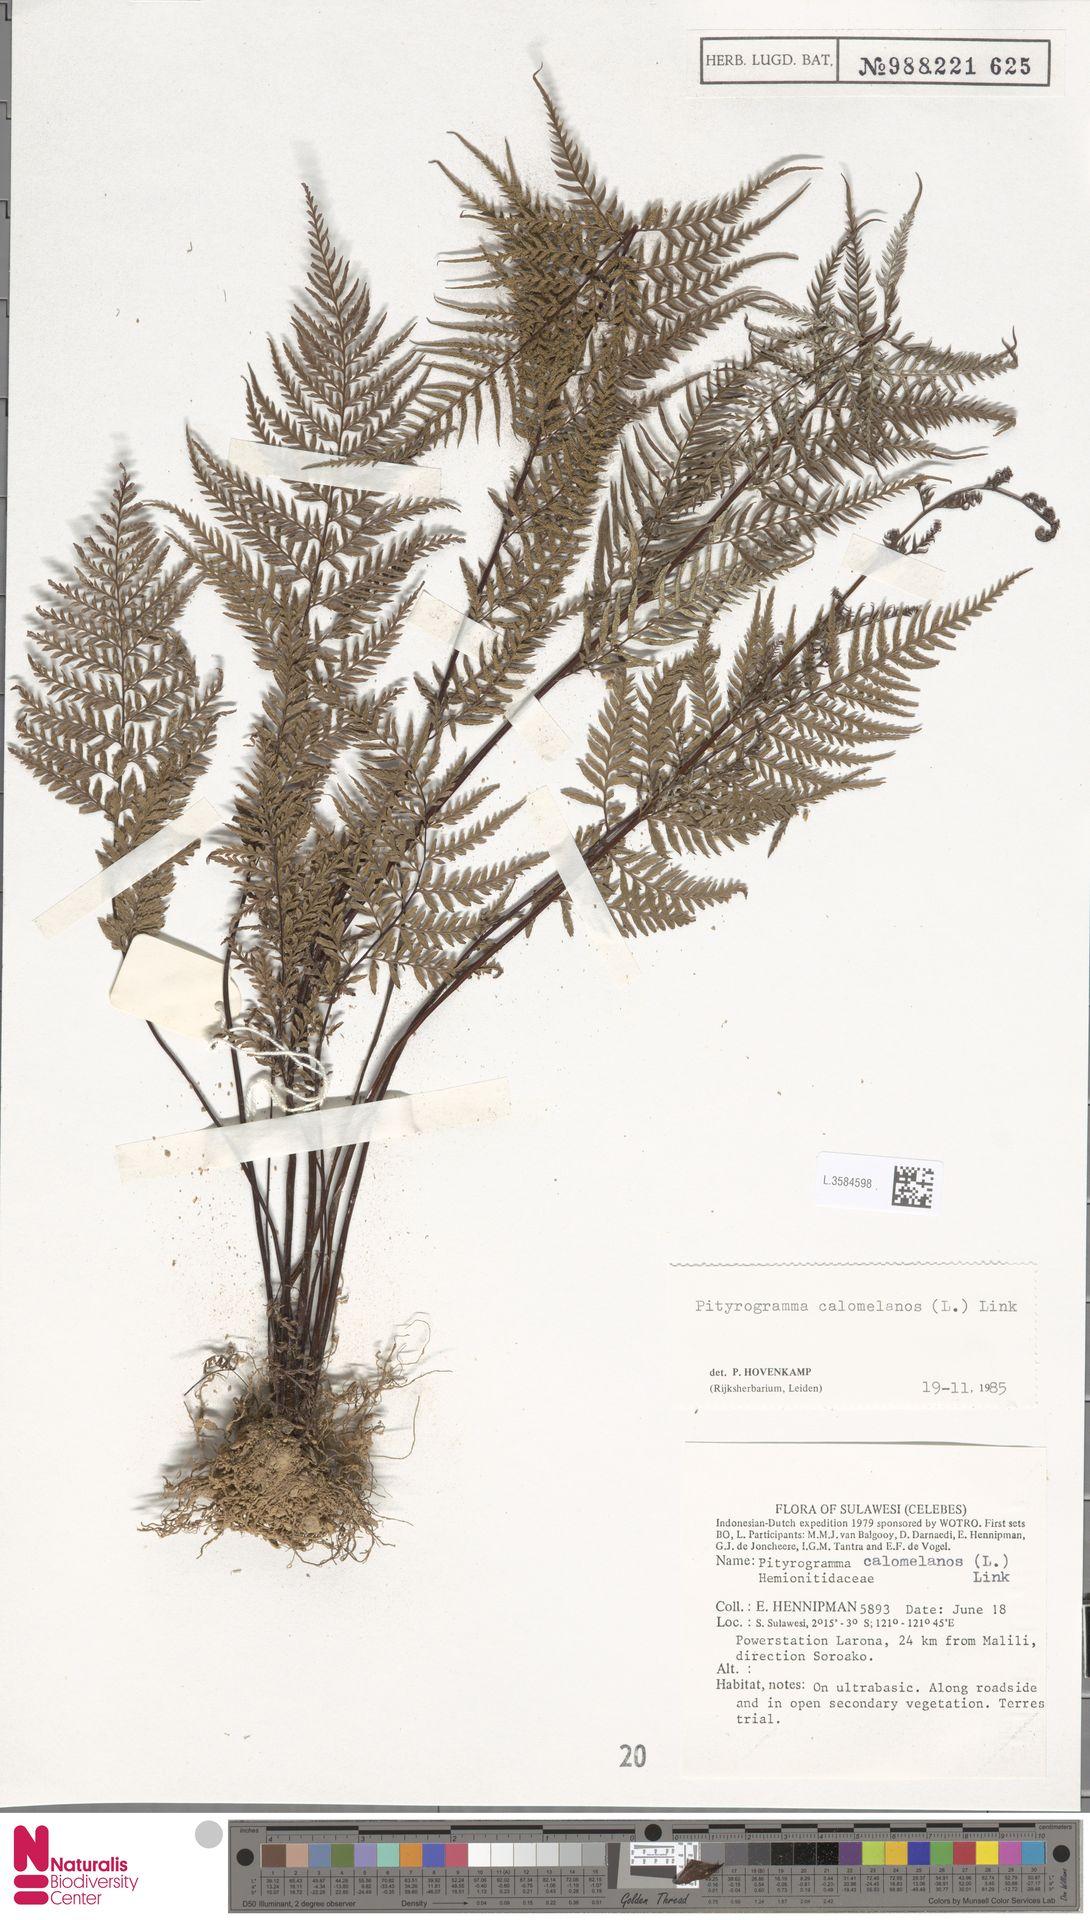 L.3584598 | Pityrogramma calomelanos (L.) Link